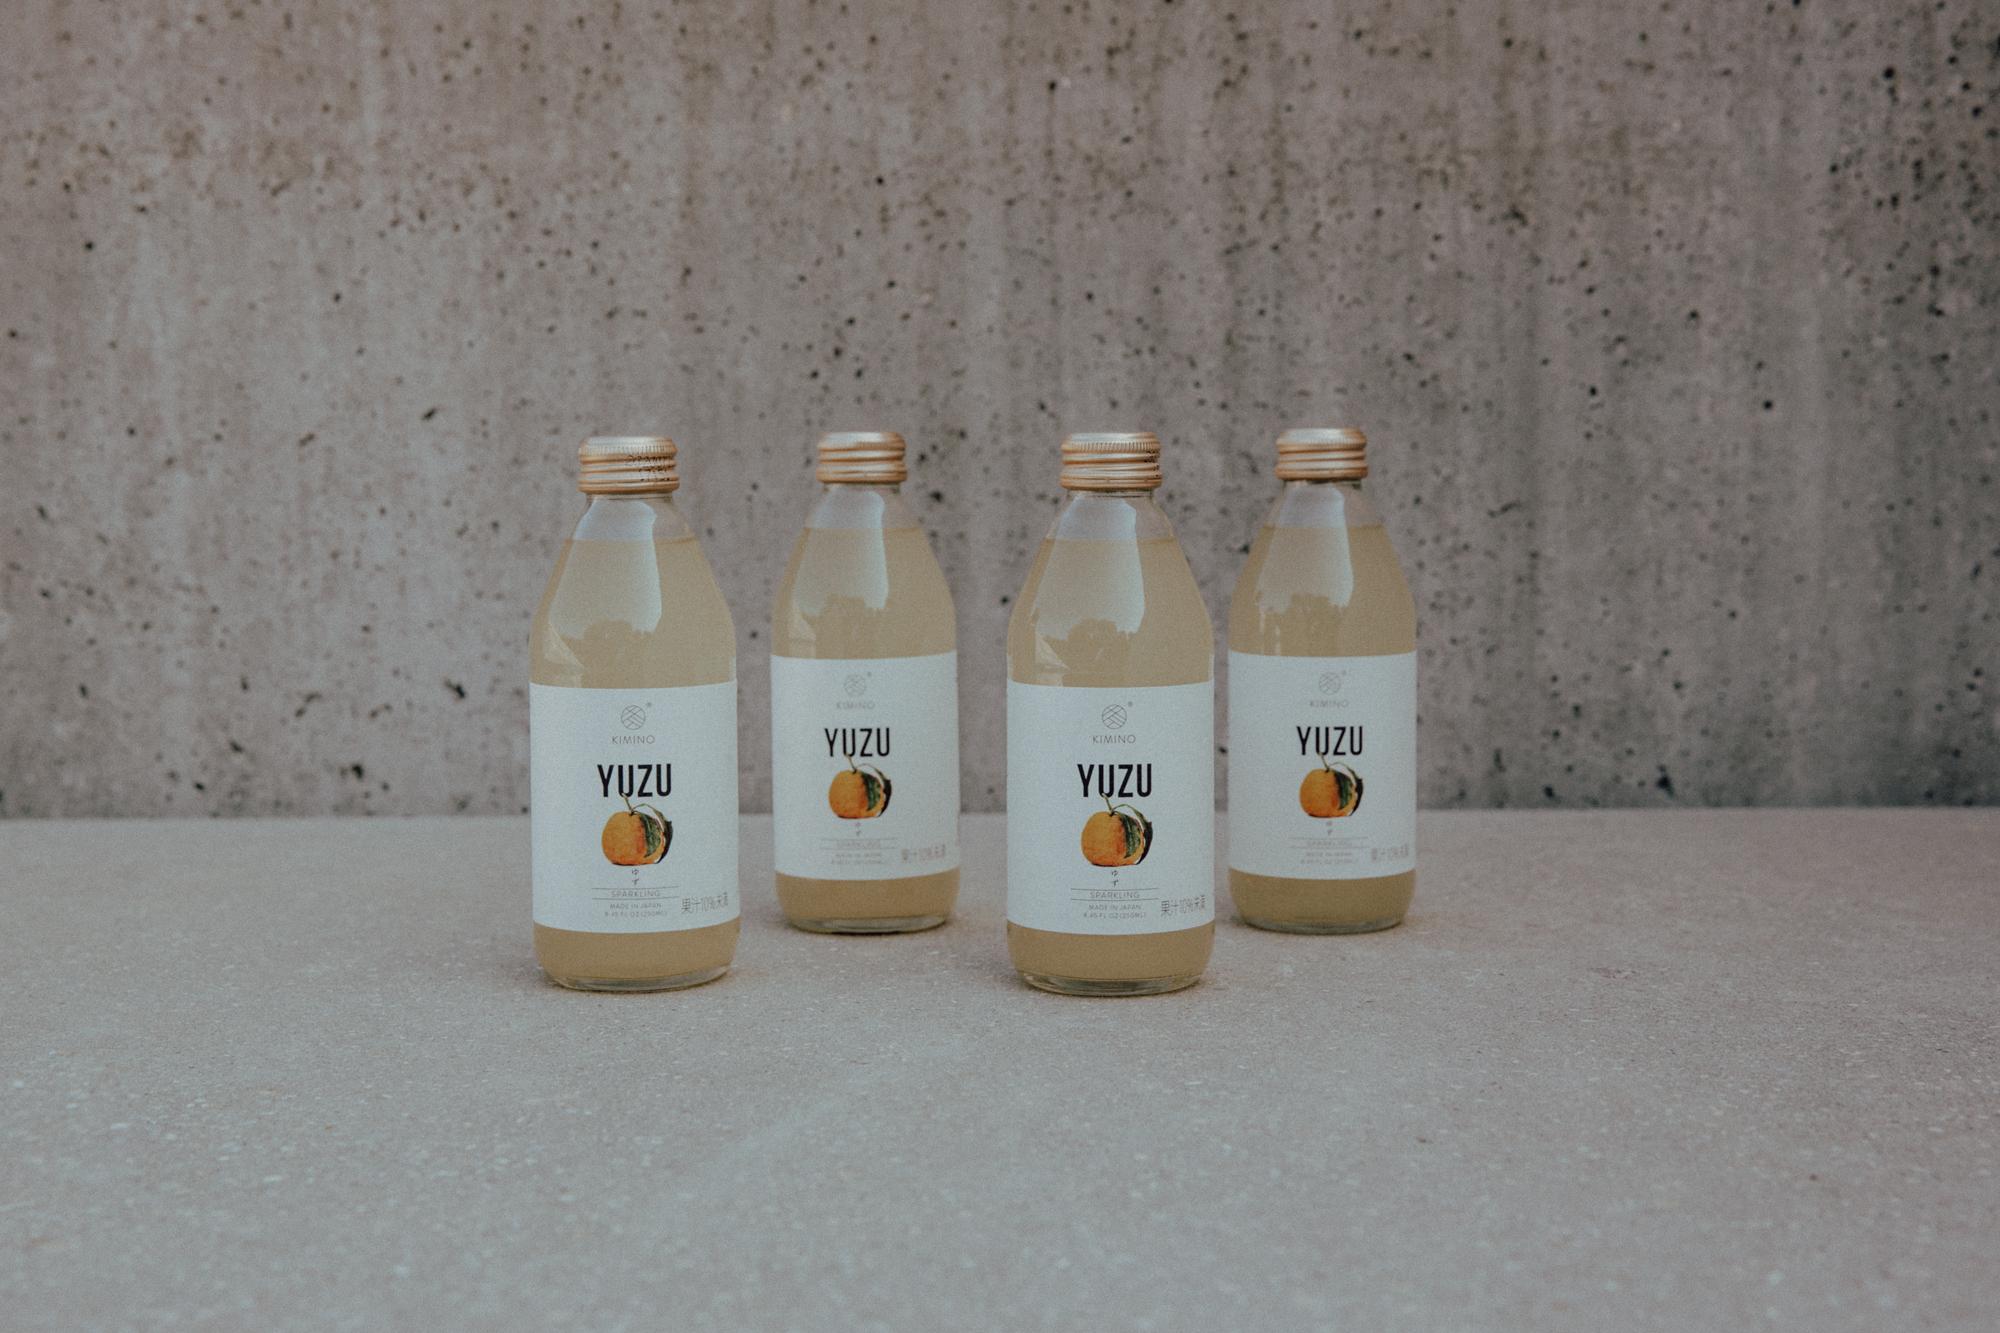 Andreas Lugmayr Kimino Sparkling Soda Yuzu